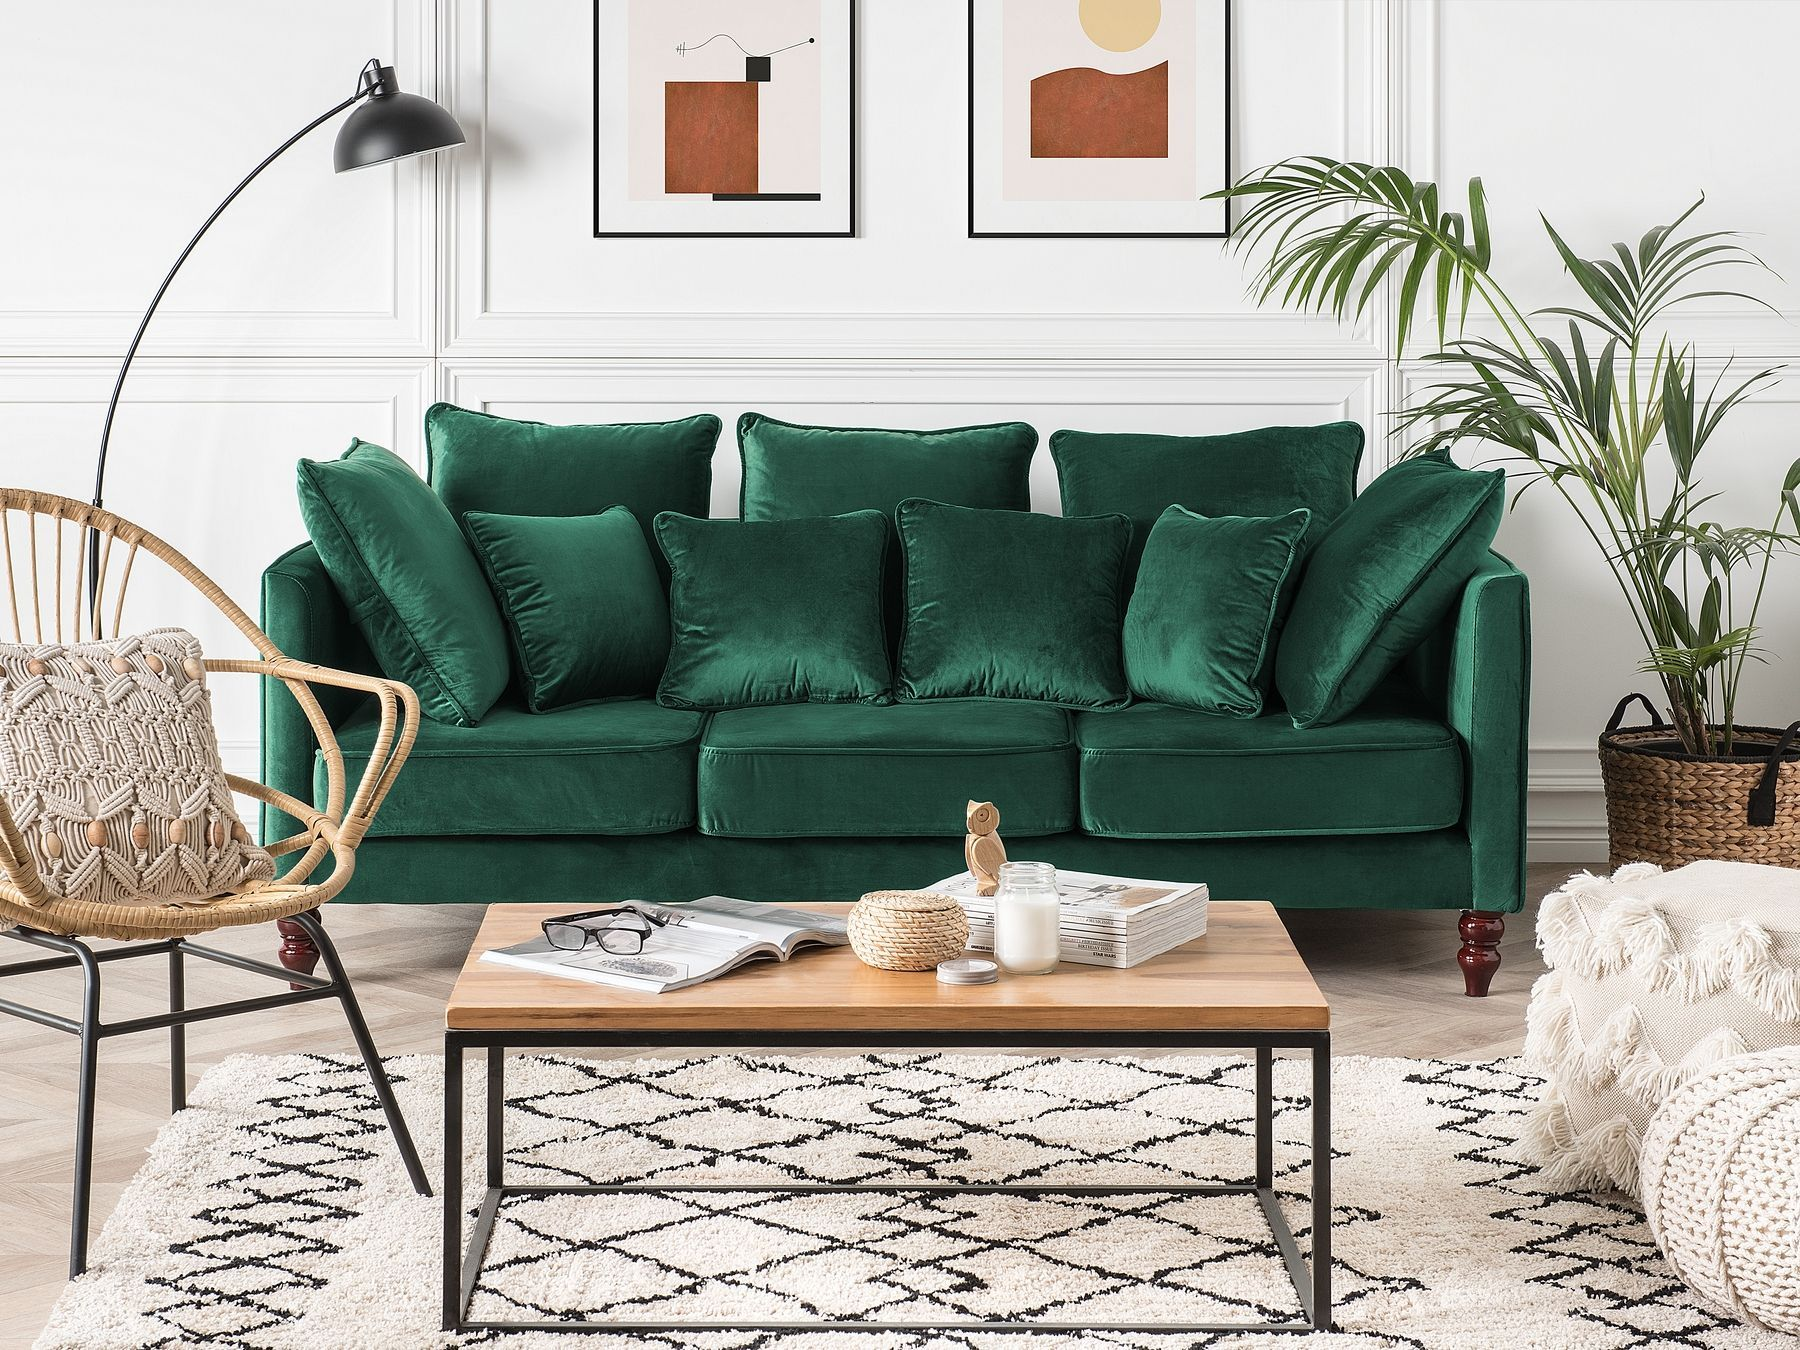 3 Seater Velvet Sofa Emerald Green FENSTAD in 2020 | Green ...